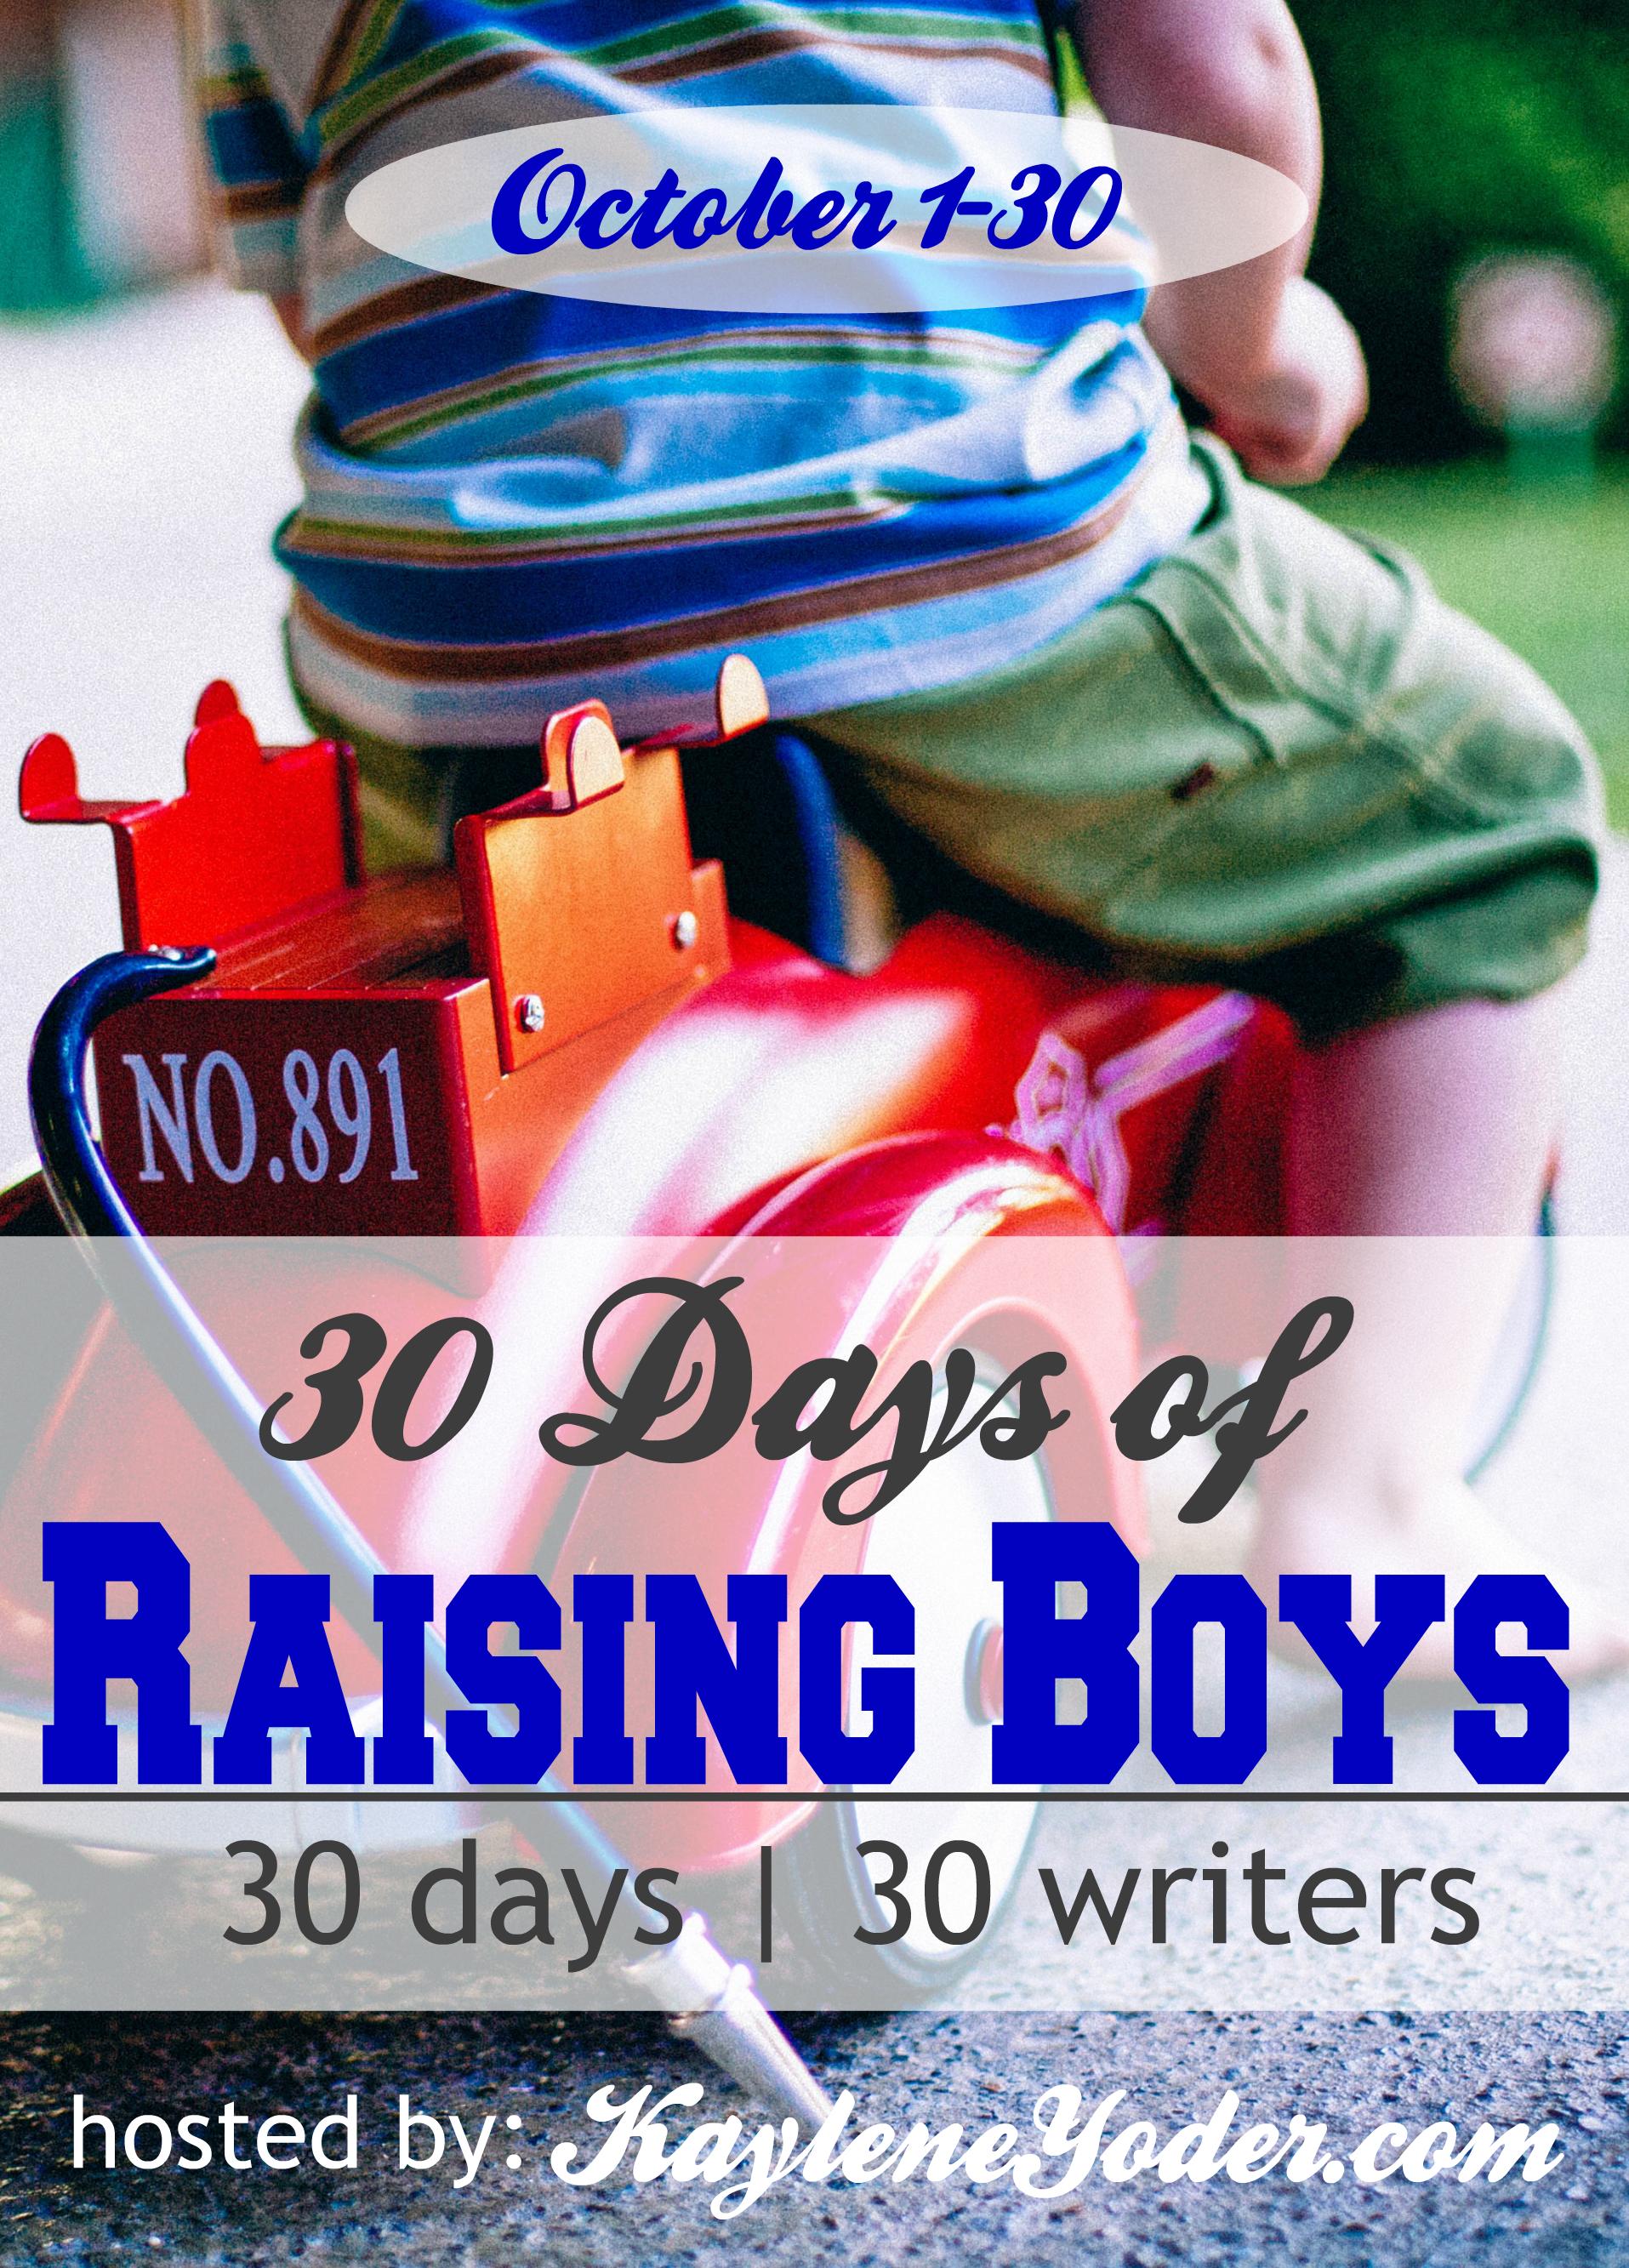 30 Days of Raising Boys